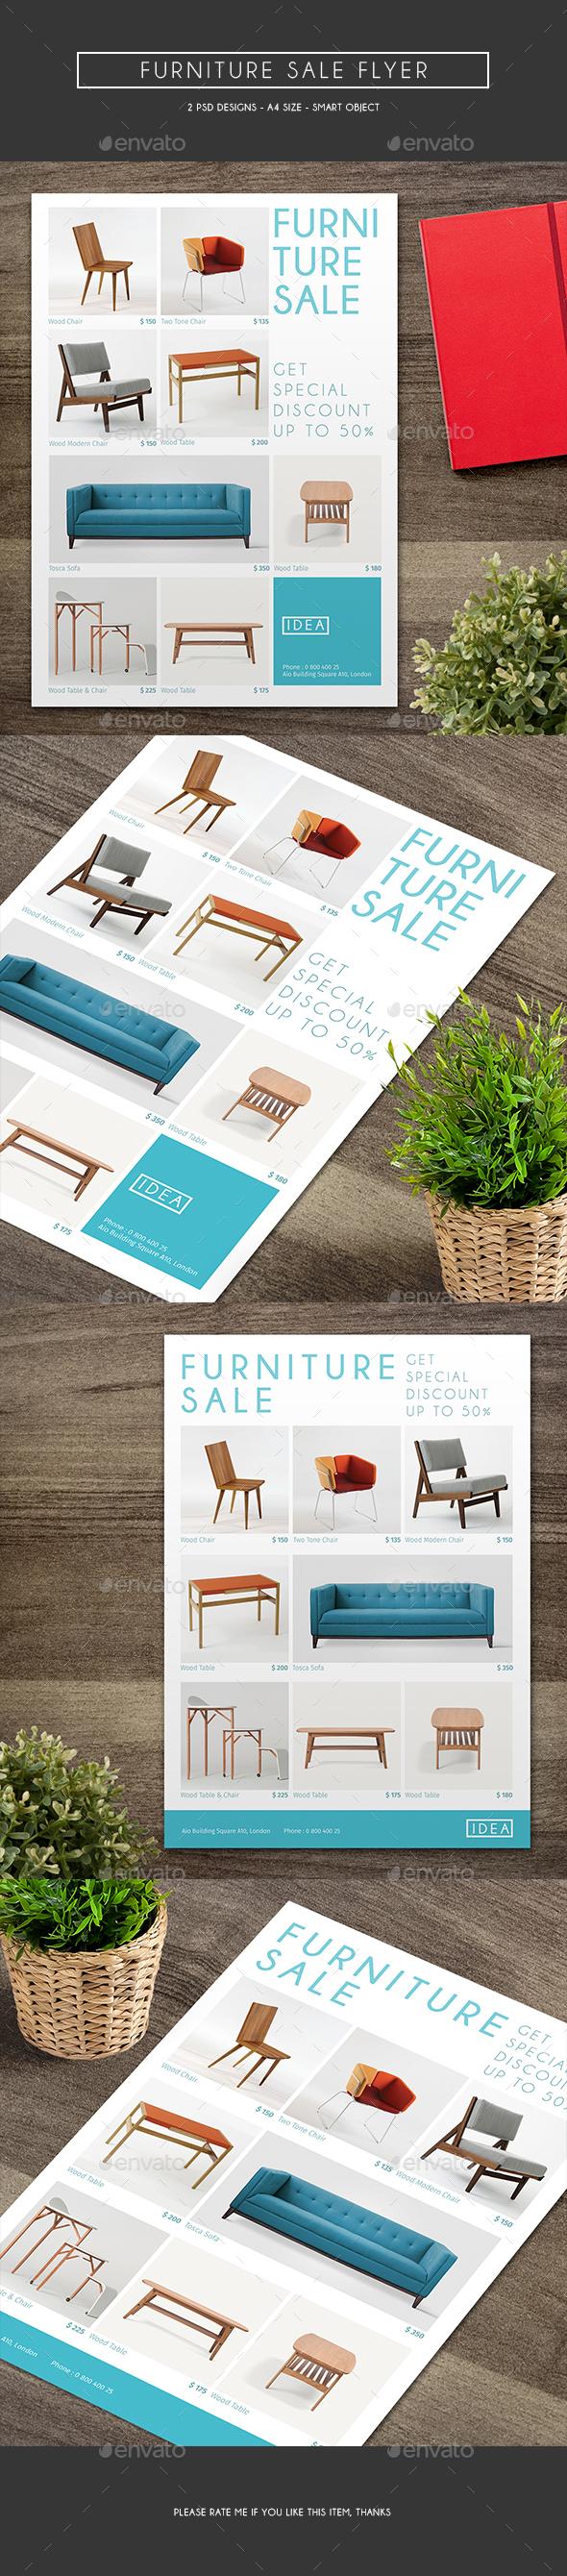 Furniture Sale Flyer - Commerce Flyers